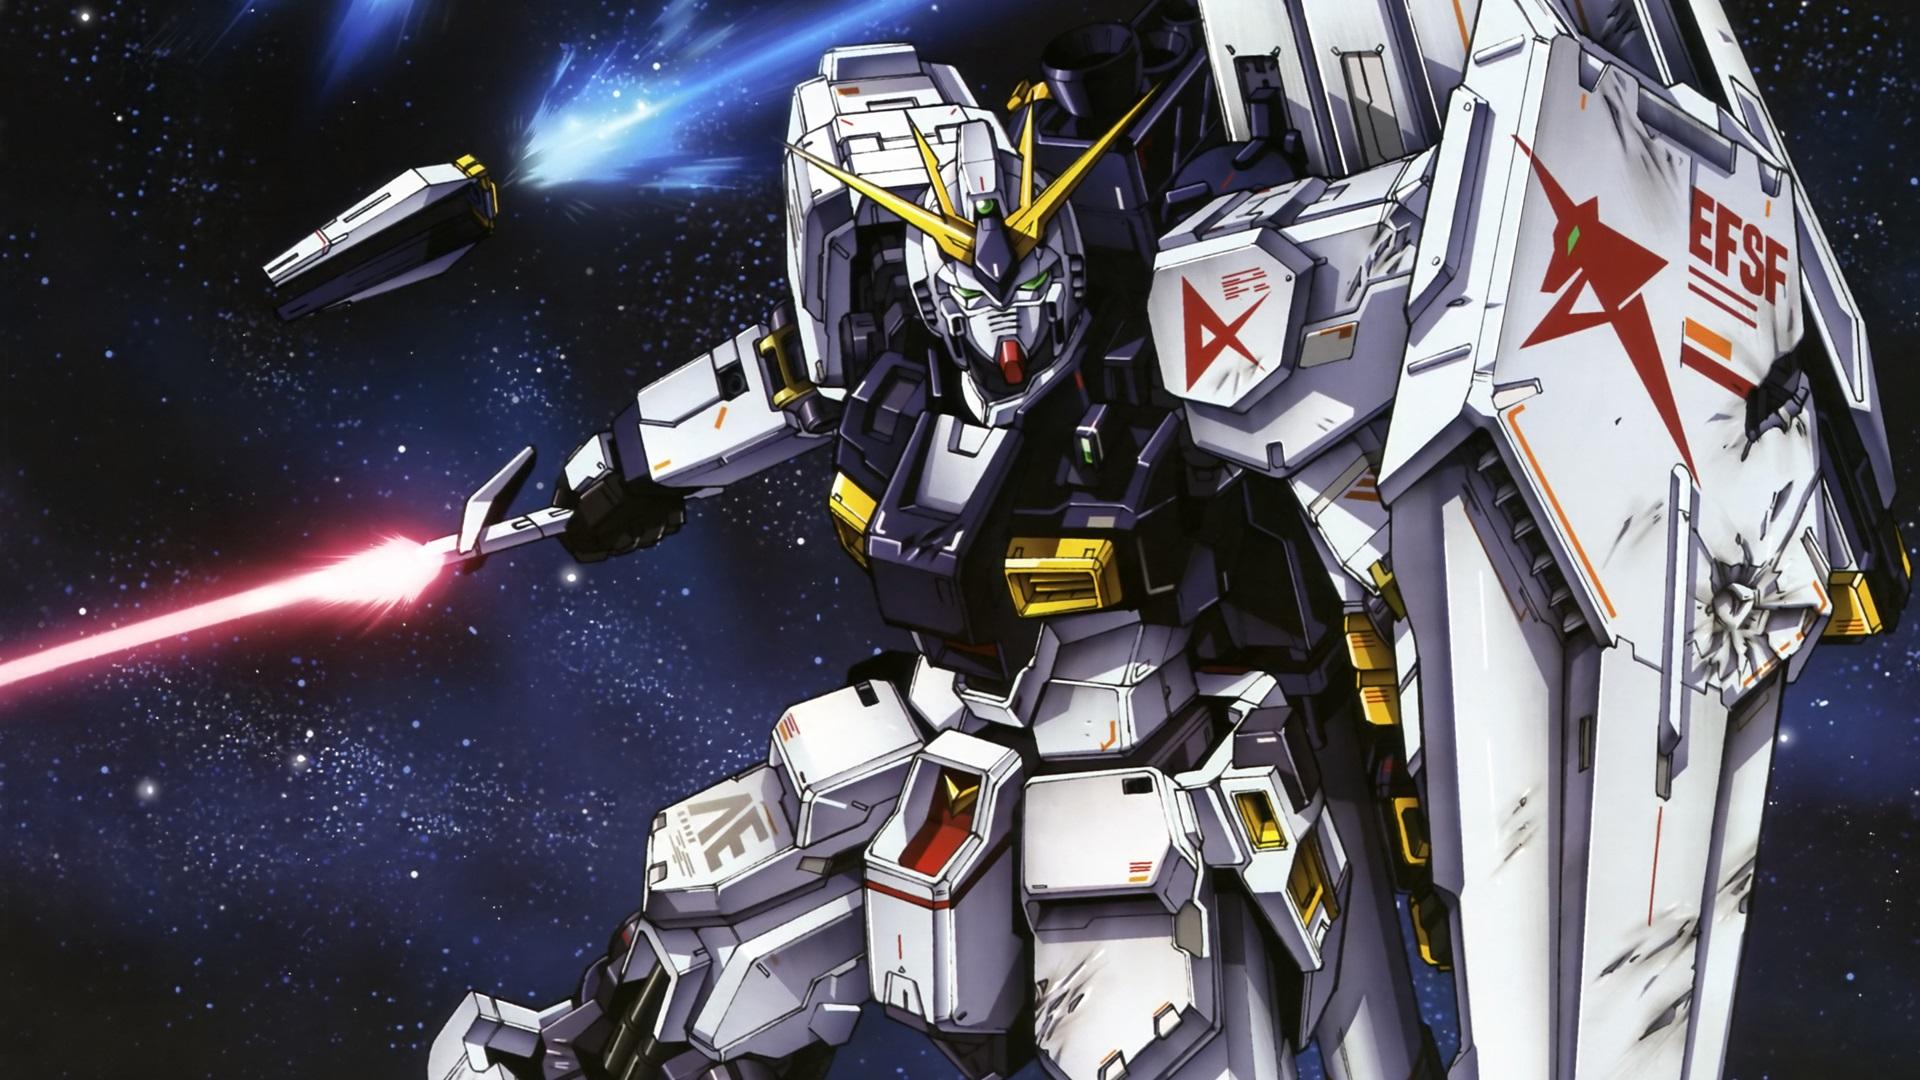 Mobile-Suit-Gundam-Japanese-anime_1920x1080.jpg